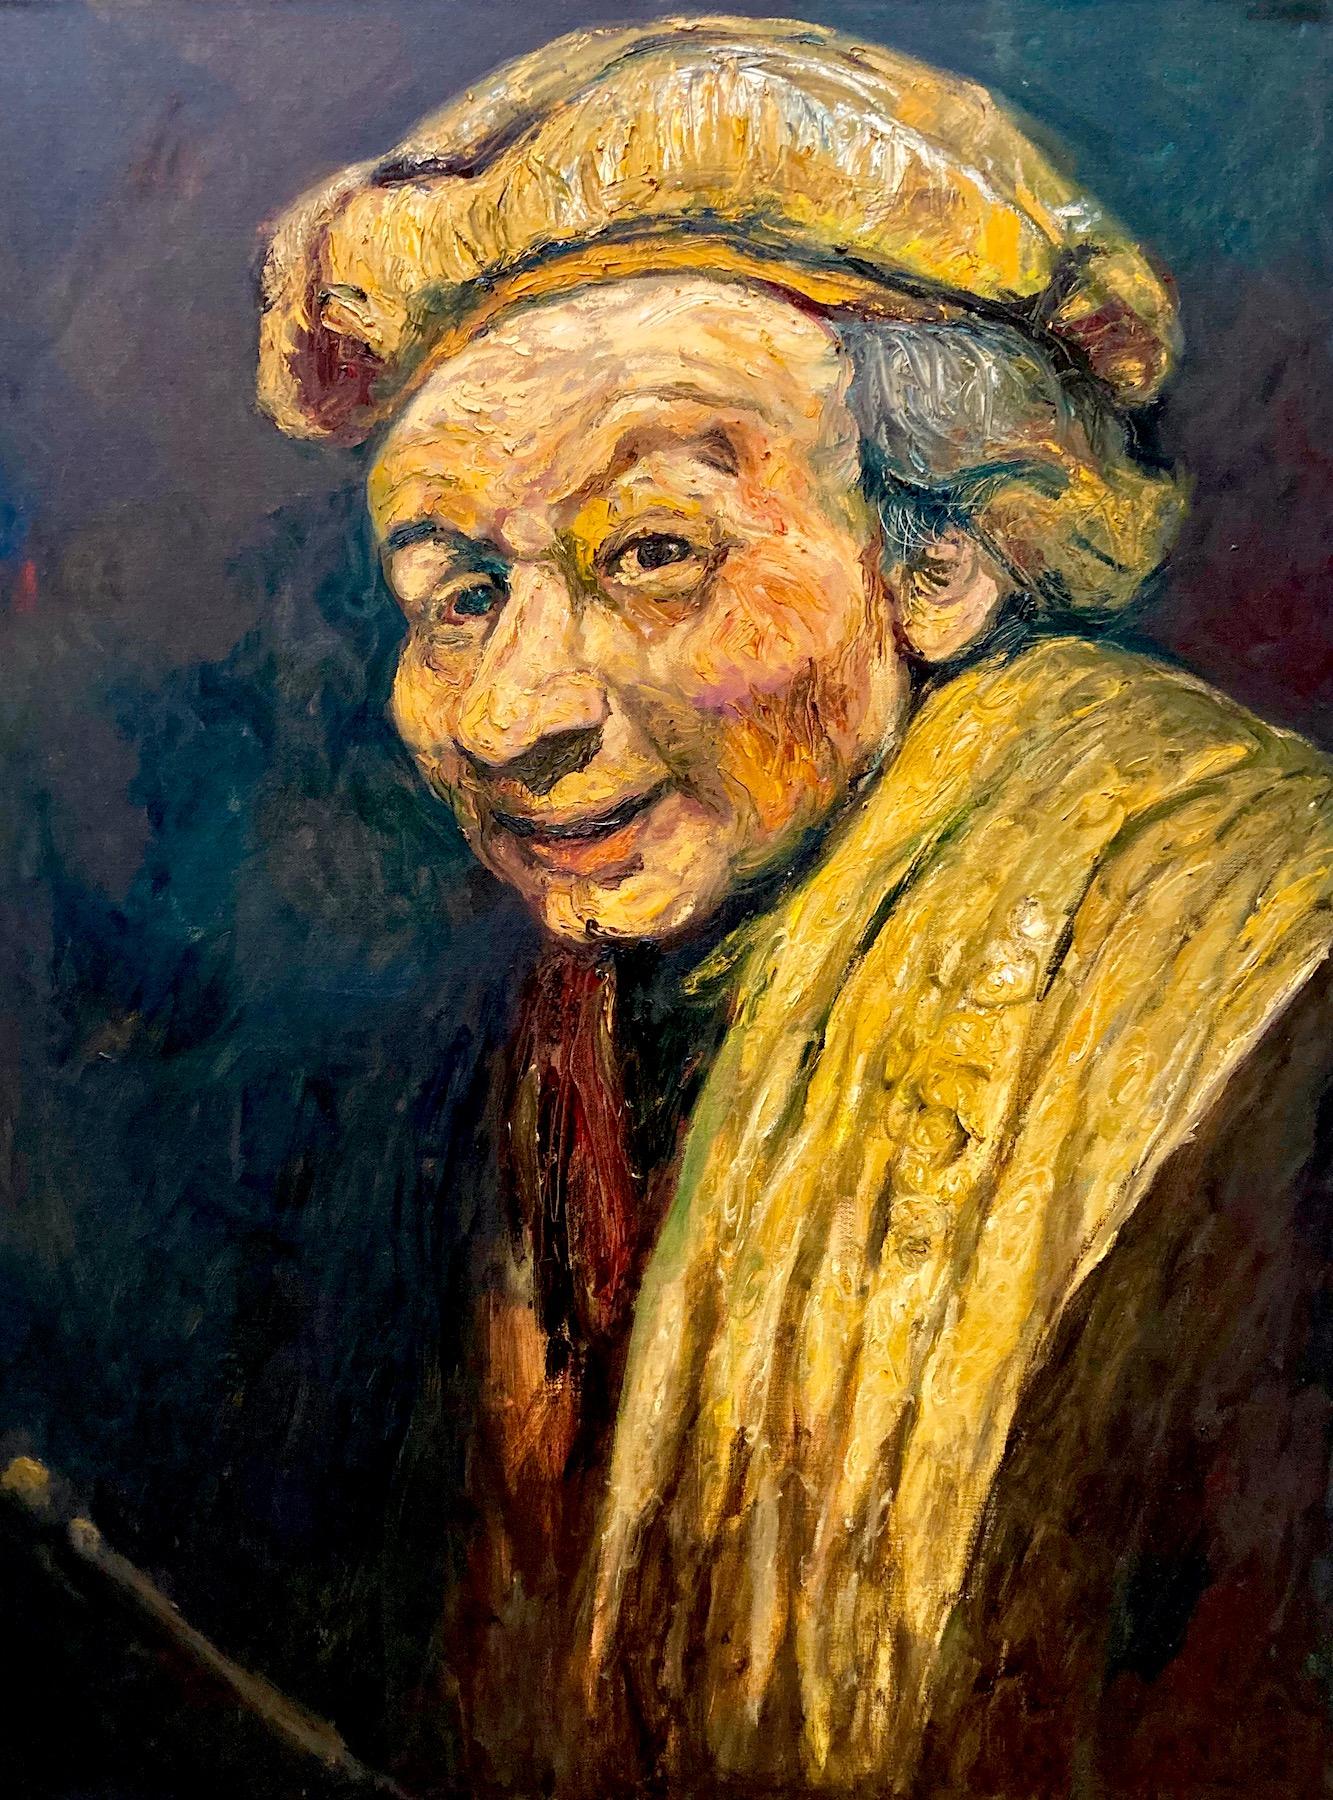 Santiago Pérez: Meditation on Rembrandt 7